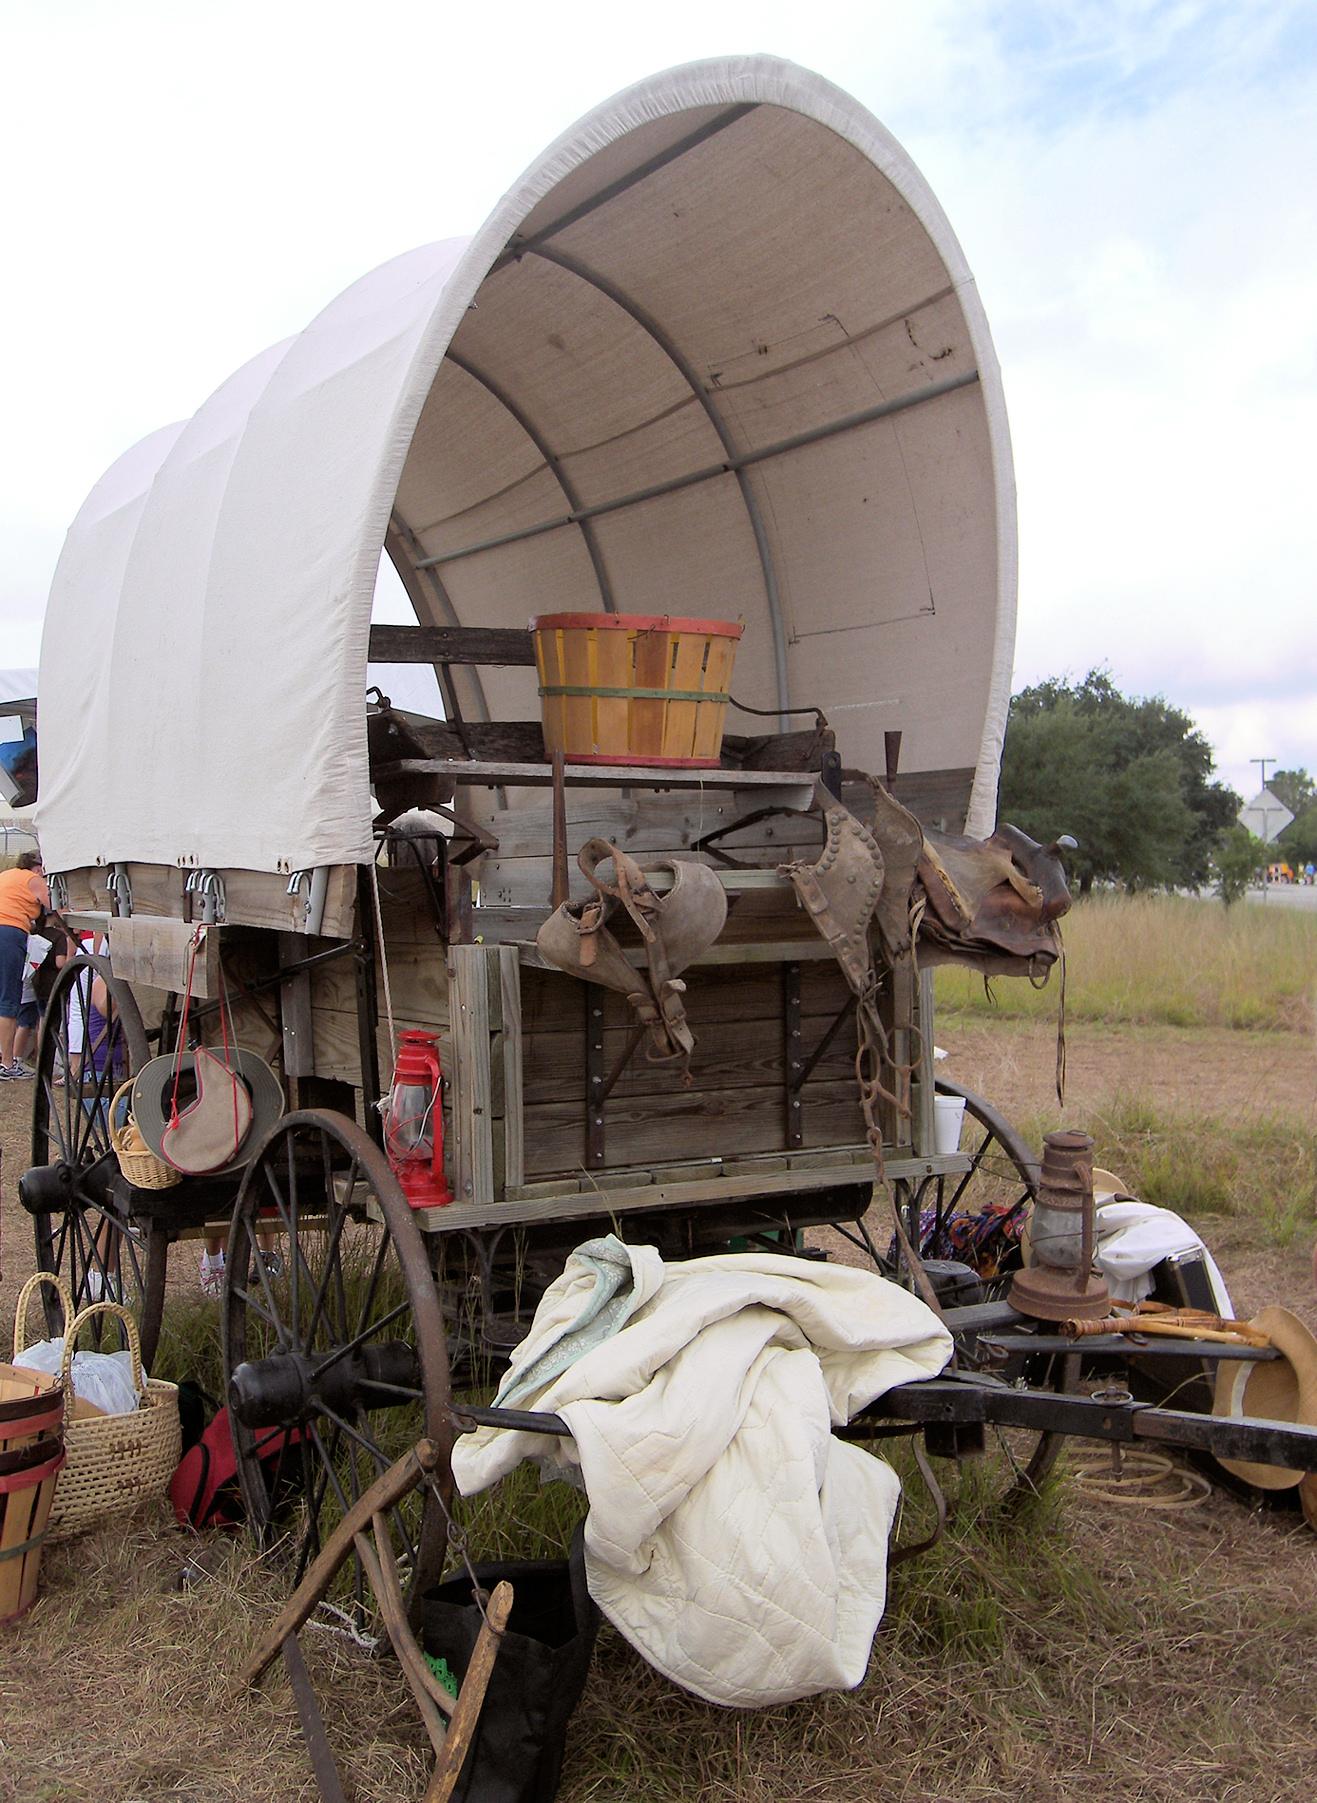 File:Covered wagon.jpg